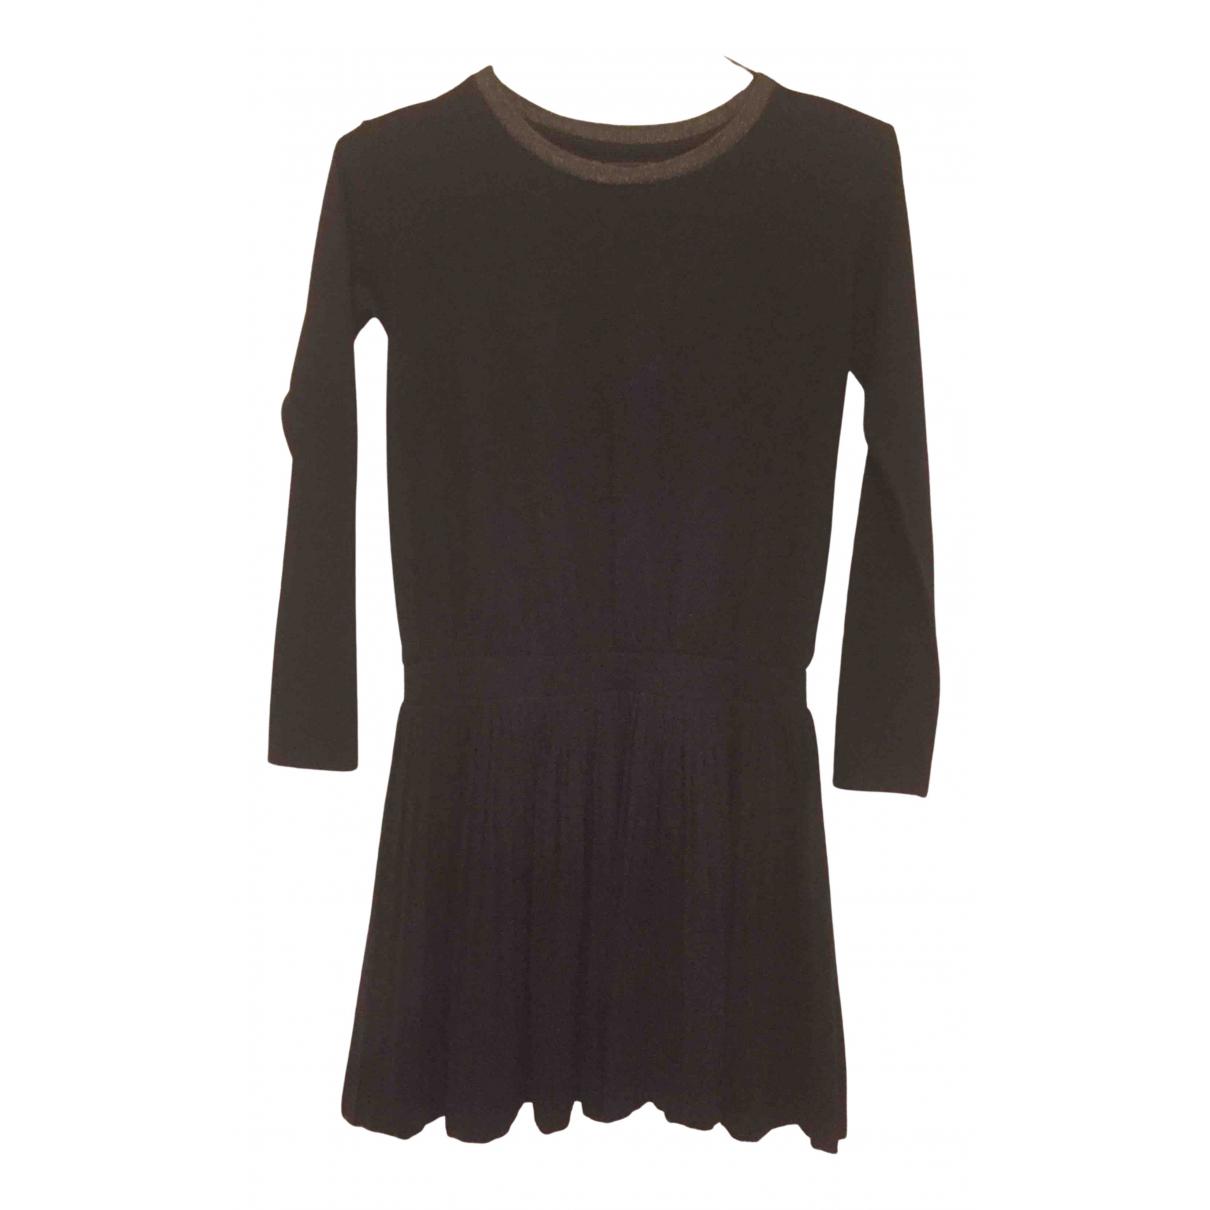 Bellerose \N Kleid in  Schwarz Polyester